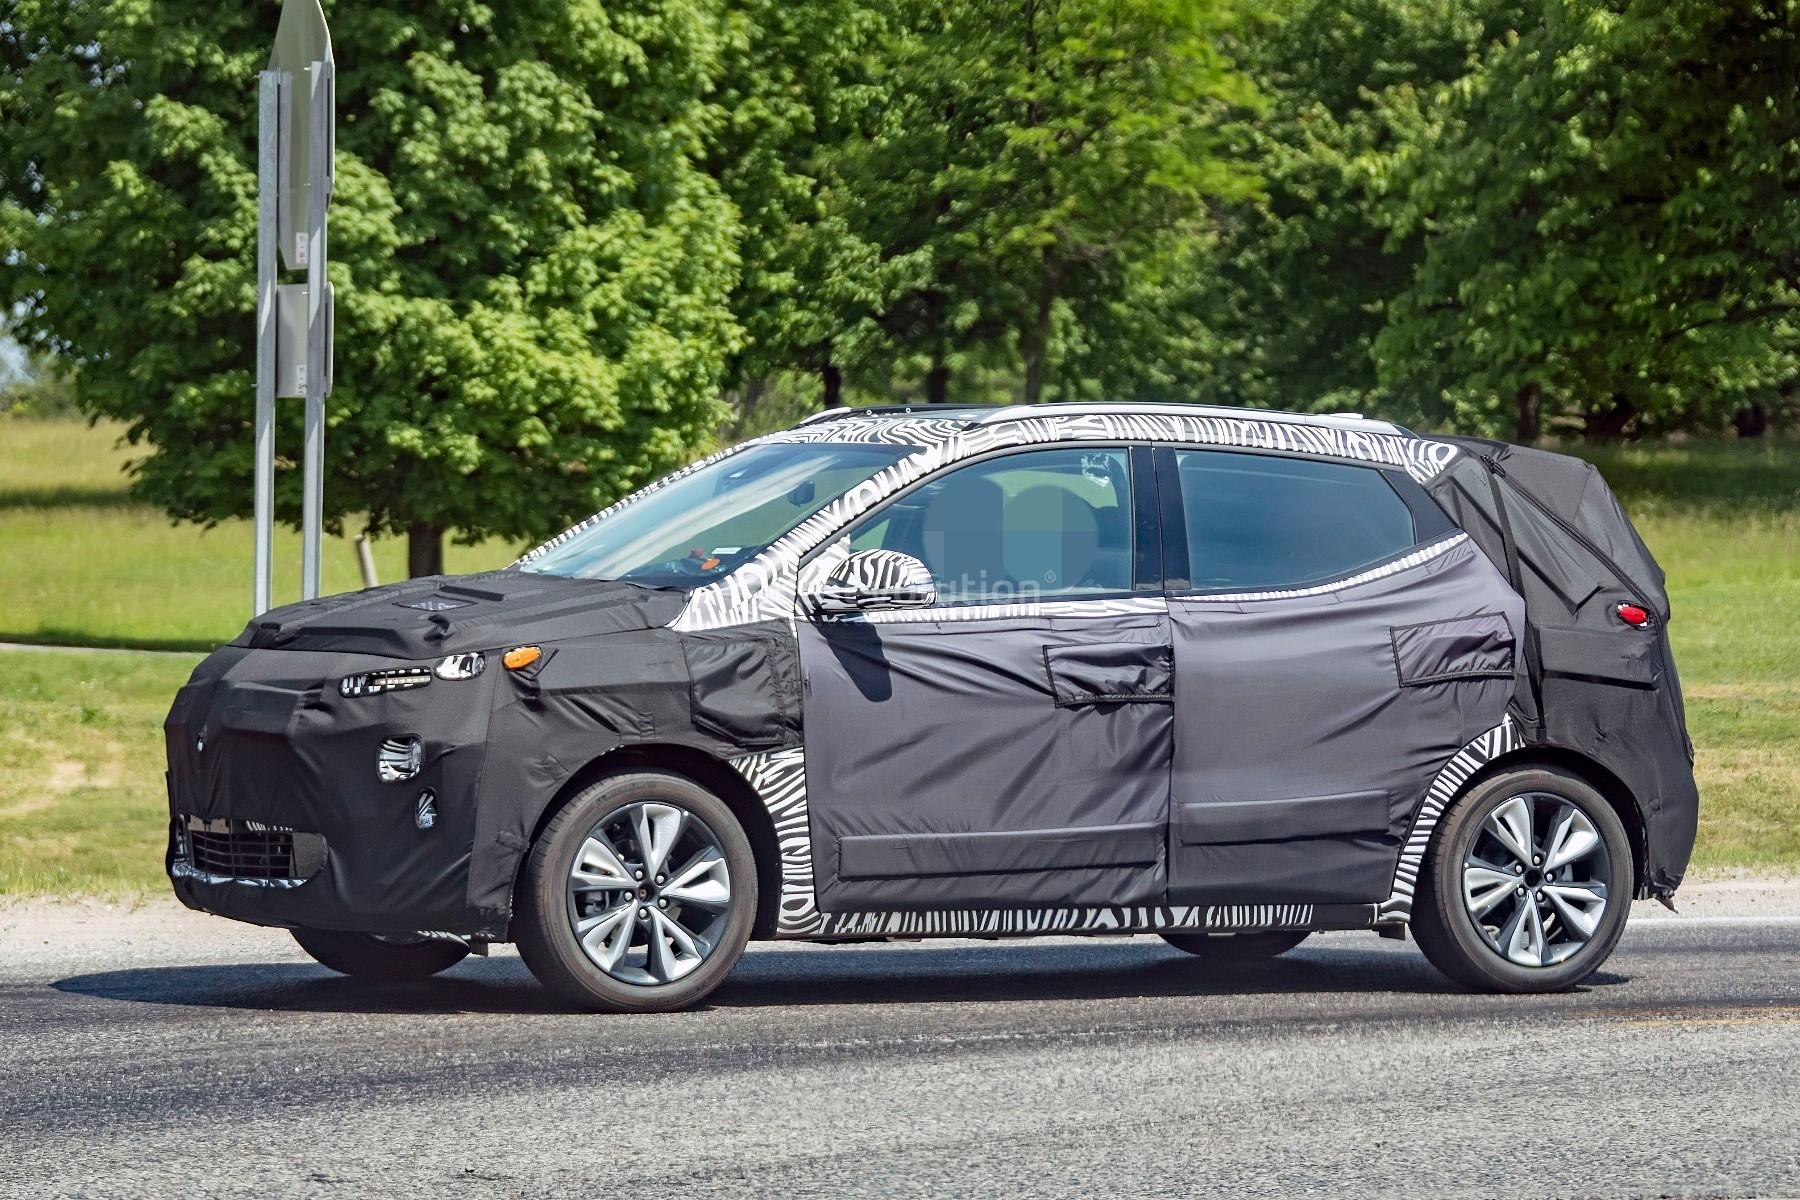 2022 Chevrolet Bolt Euv Teased Along With Facelifted Chevrolet Bolt Ev Autoevolution